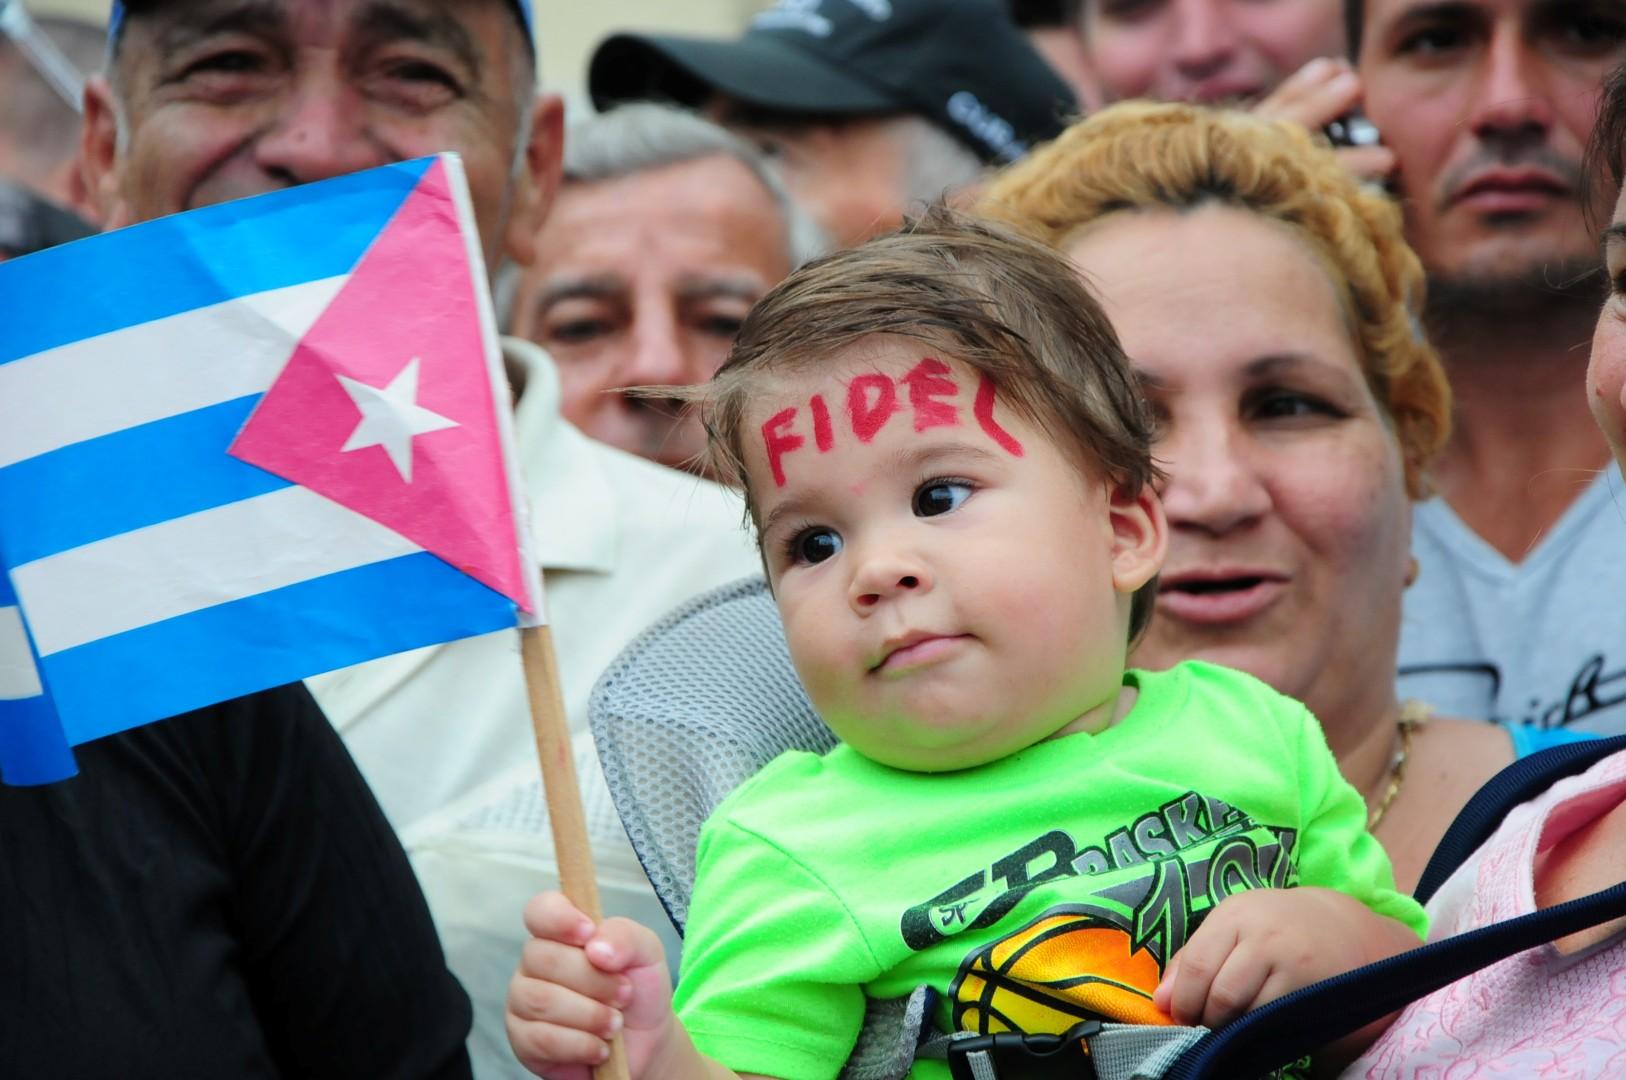 caravana, Fidel Castro, Comandante en Jefe, homenaje a Fidel, tributo a Fidel, Sancti Spíritus, Cuba